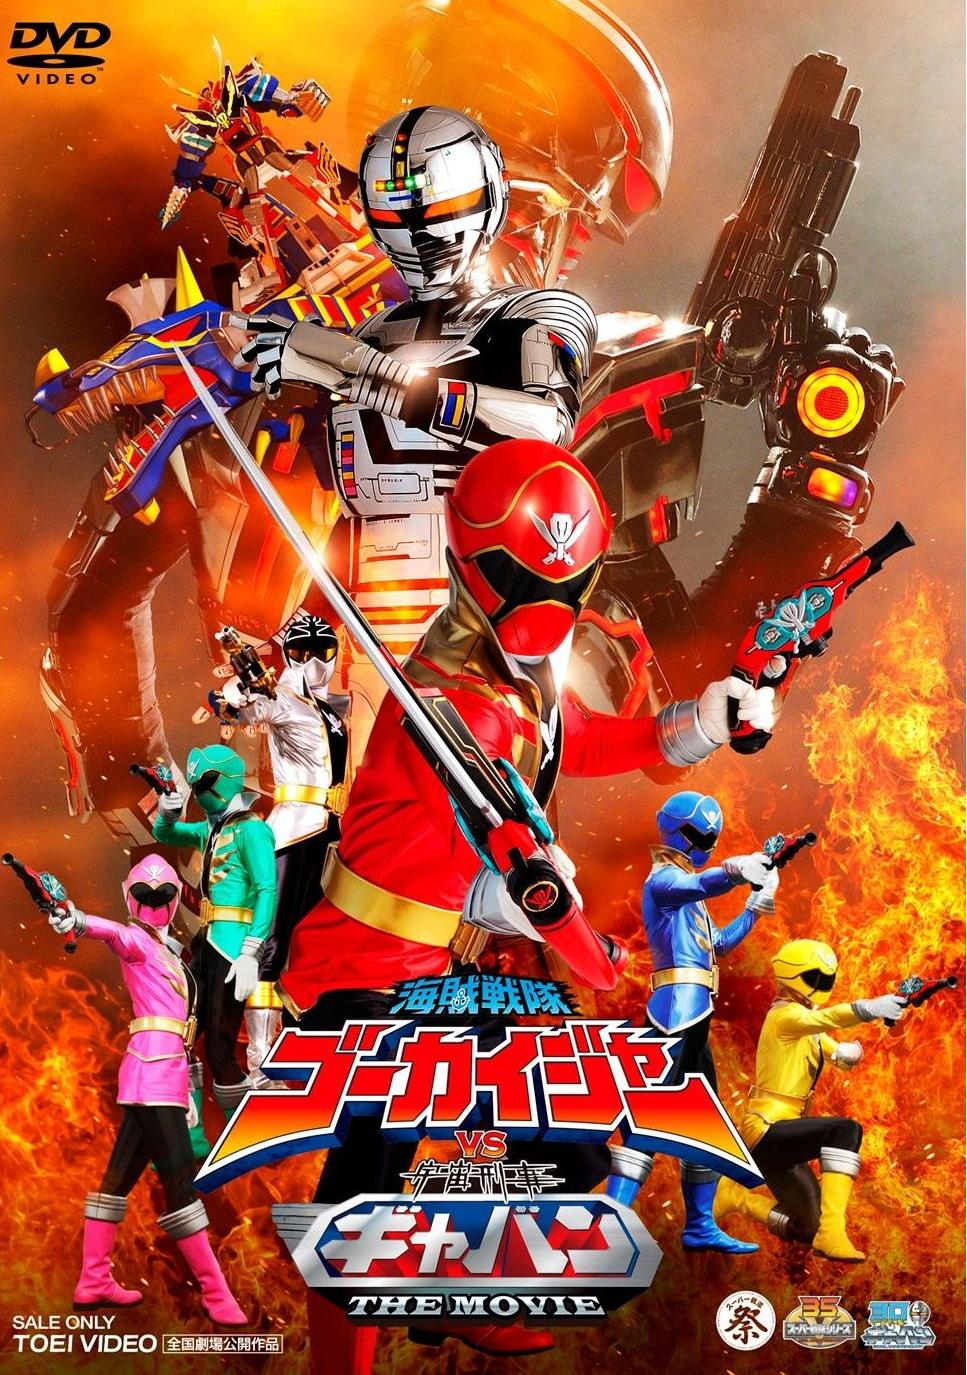 affiche du film Kaizoku Sentai Gokaiger vs. Space Sheriff Gavan, The Movie